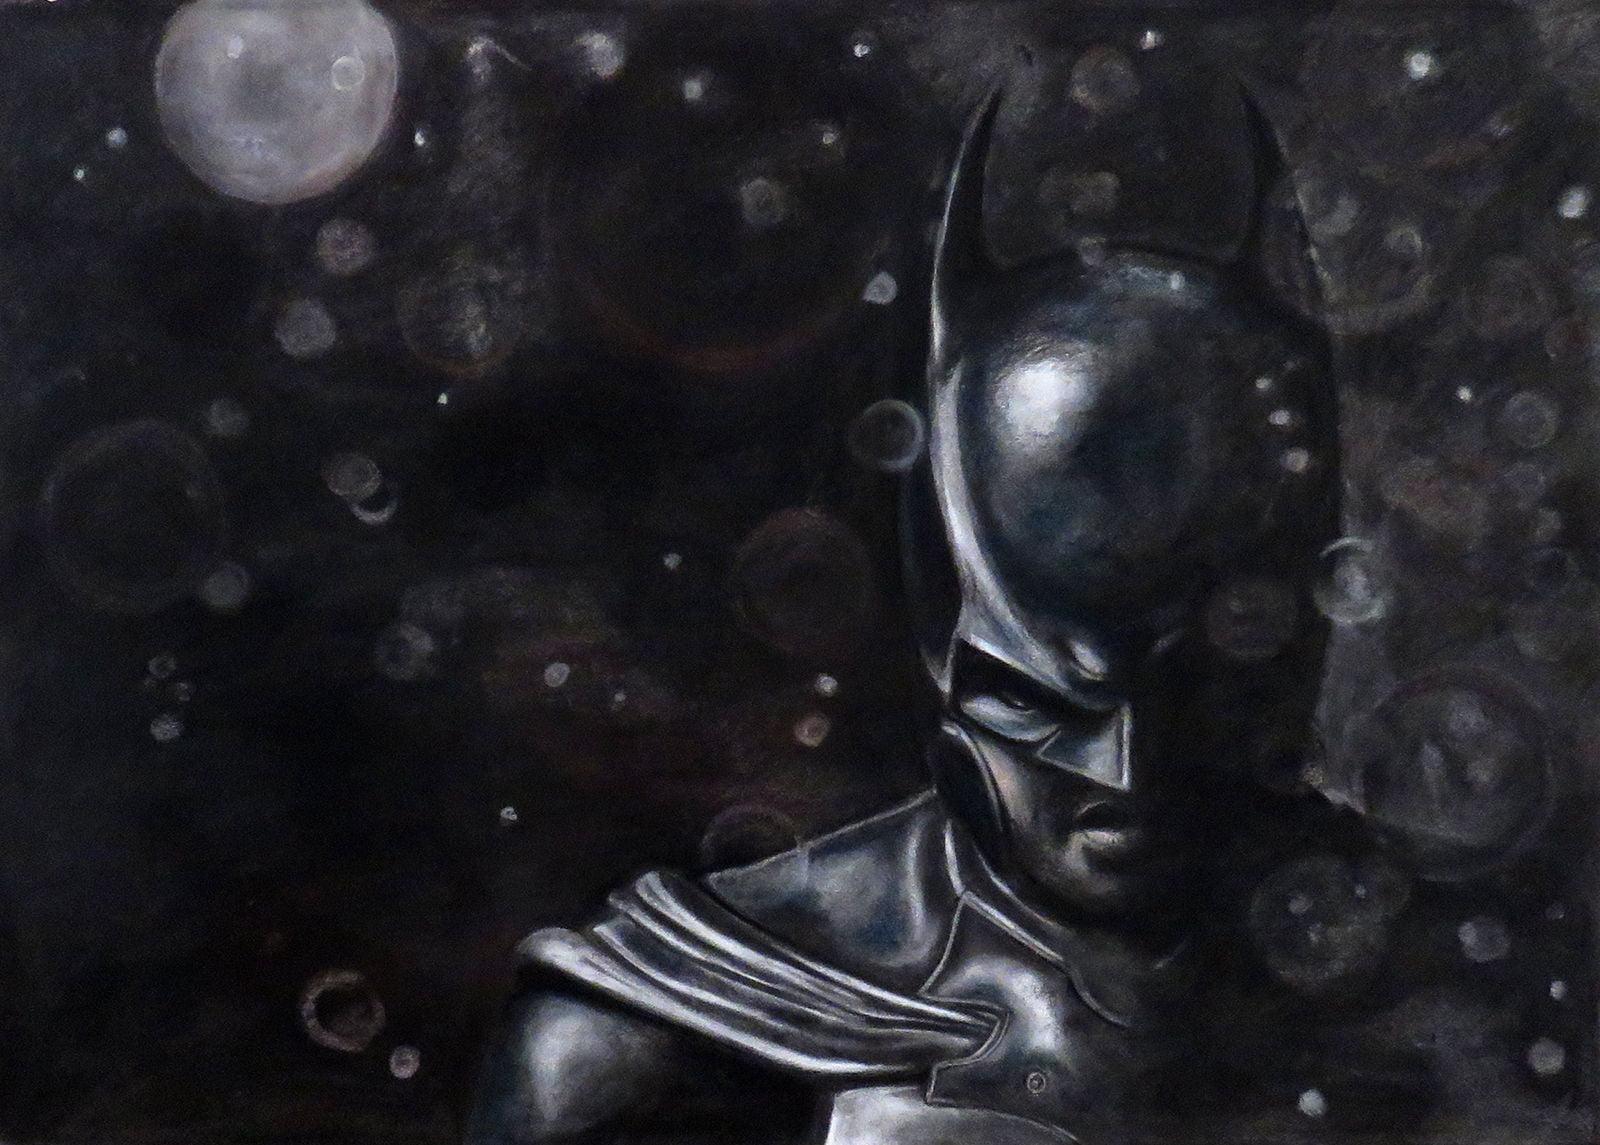 Batman charcoal drawing